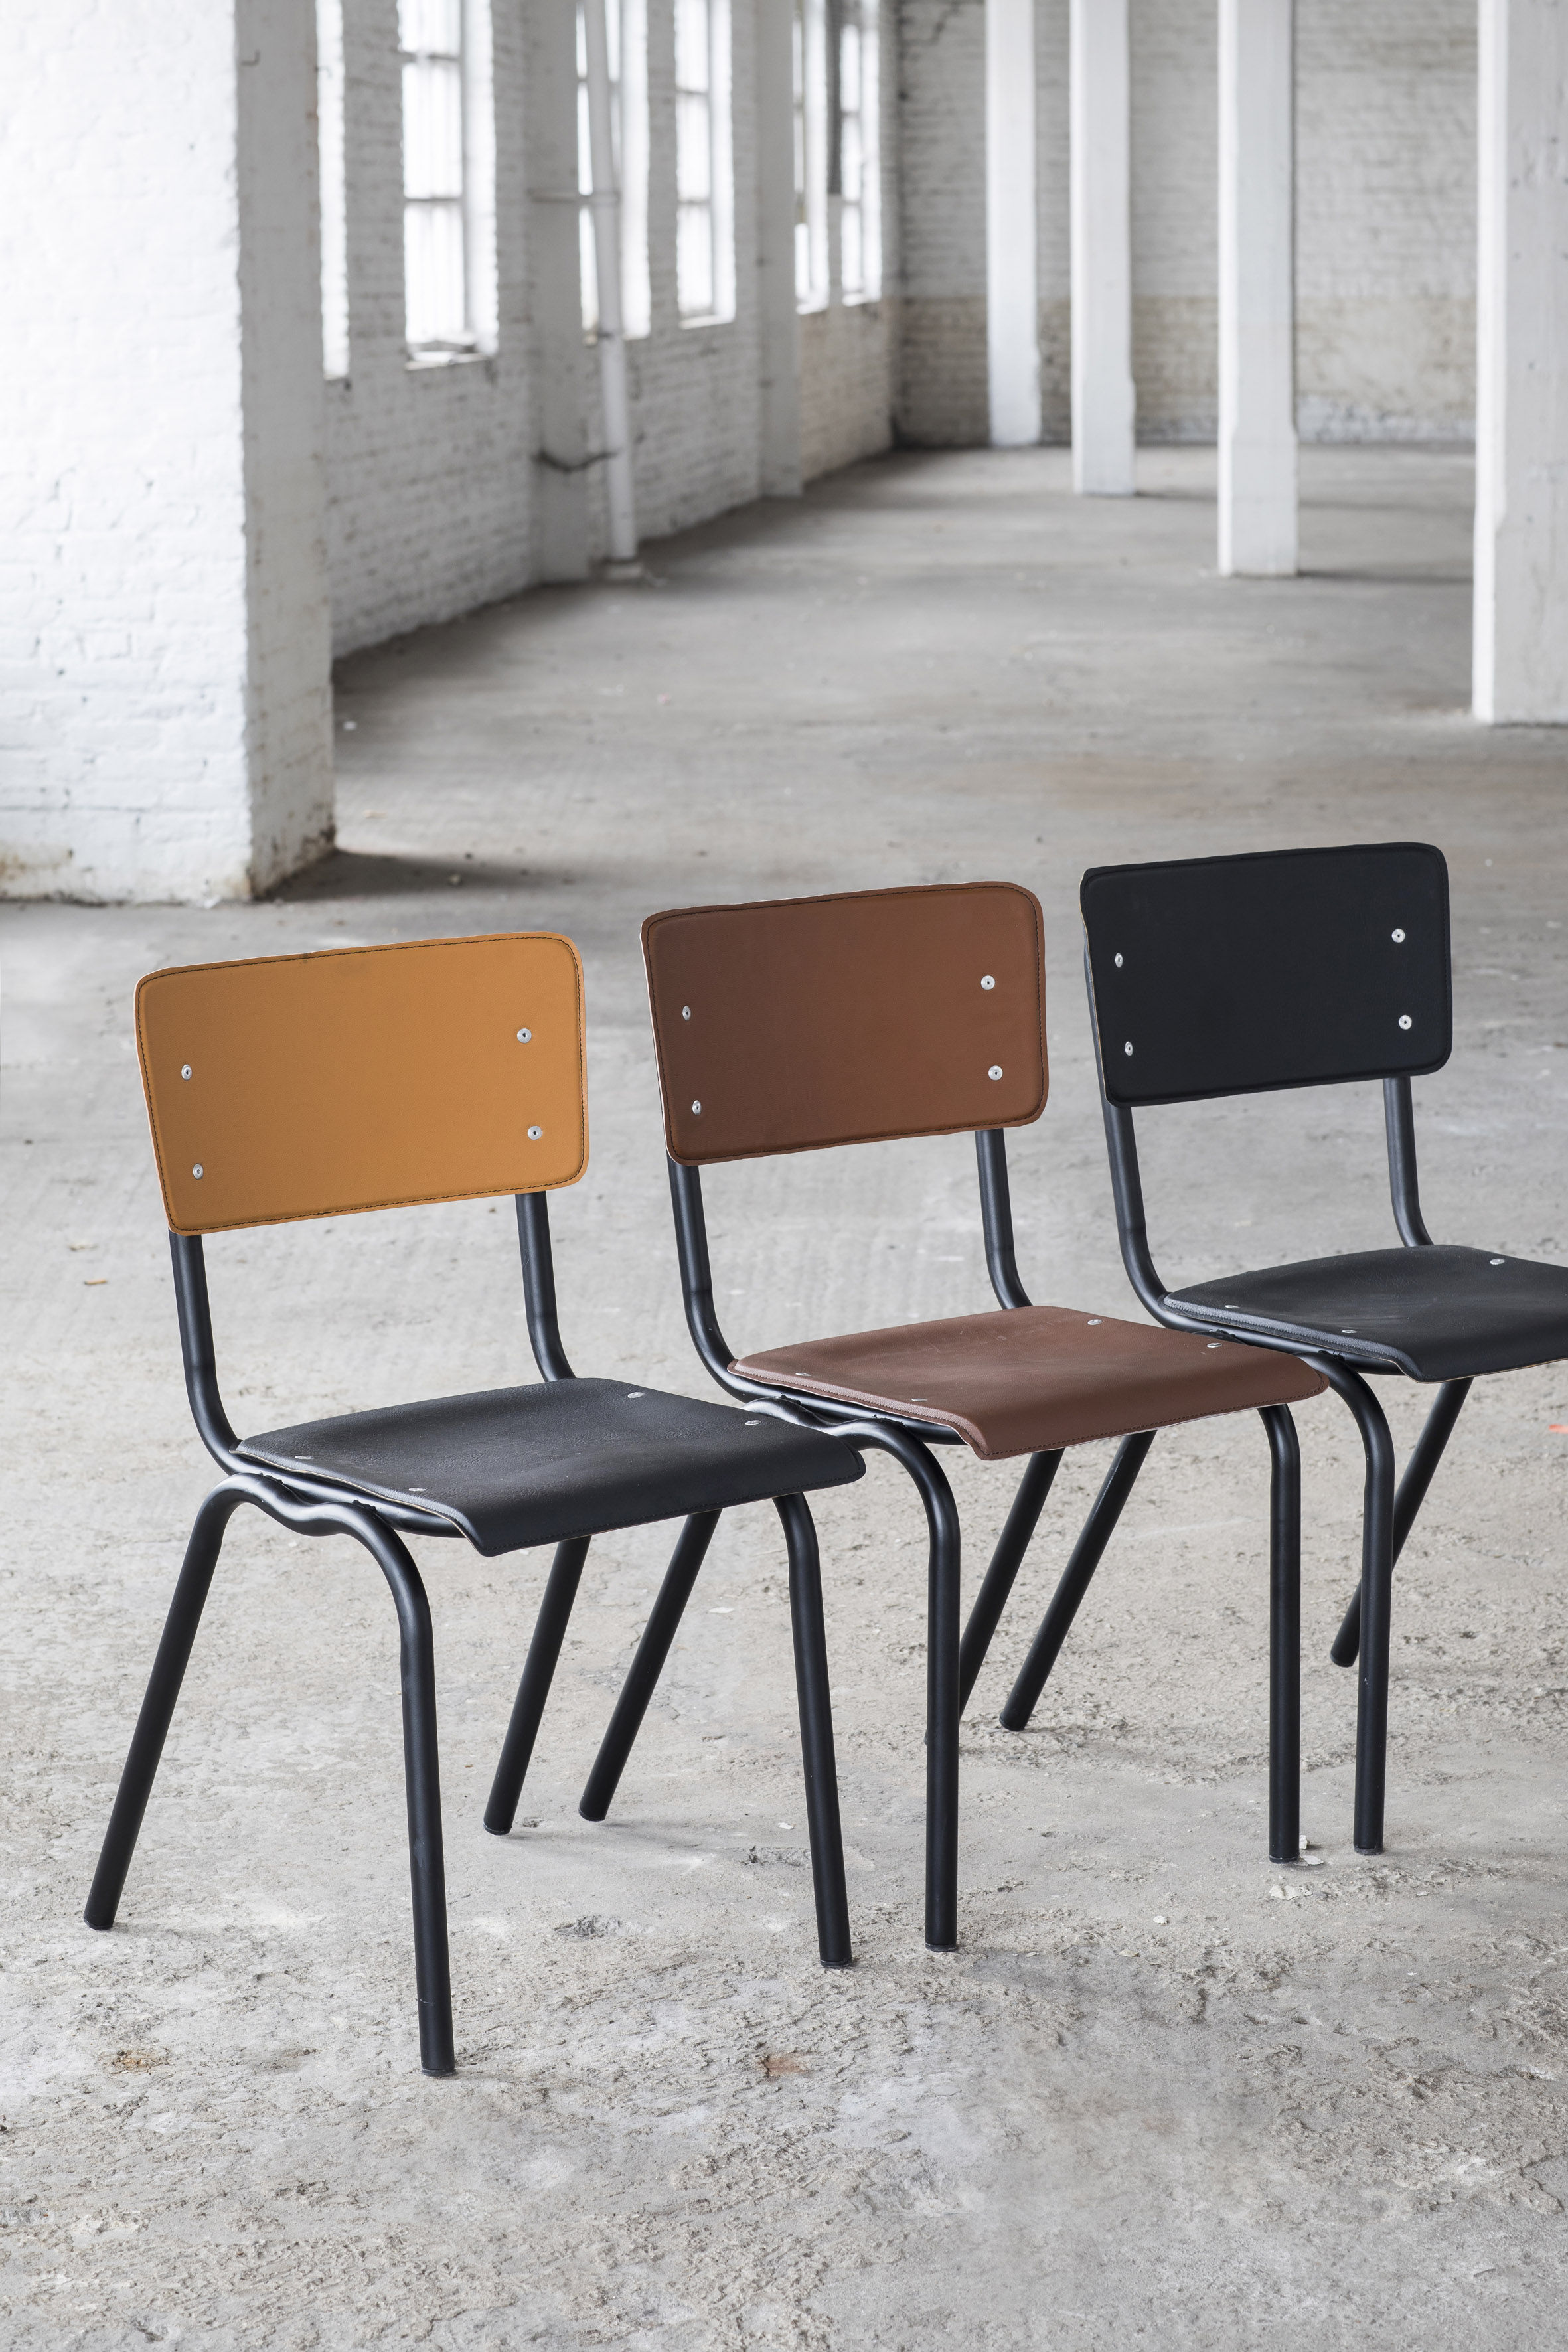 vinyl vinyl stuhl sitzfl che aus kunstleder braun. Black Bedroom Furniture Sets. Home Design Ideas